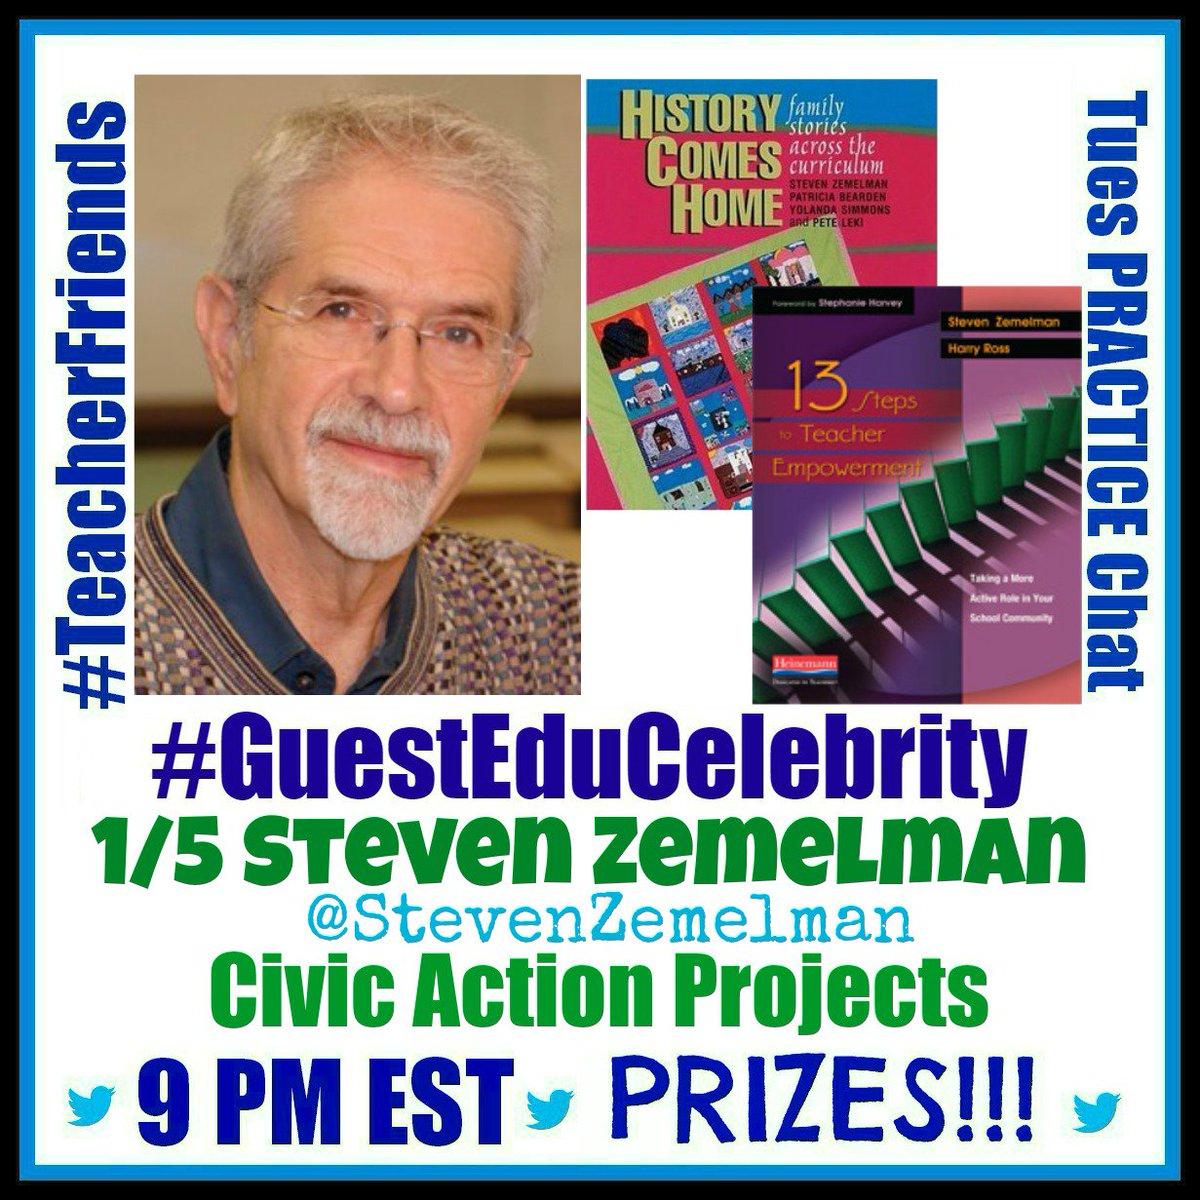 #TeacherFriends 1/5 Civic Action Projects w @StevenZemelman Win his books! Please REtweet/bring tweeps https://t.co/9WDg3VfIe8